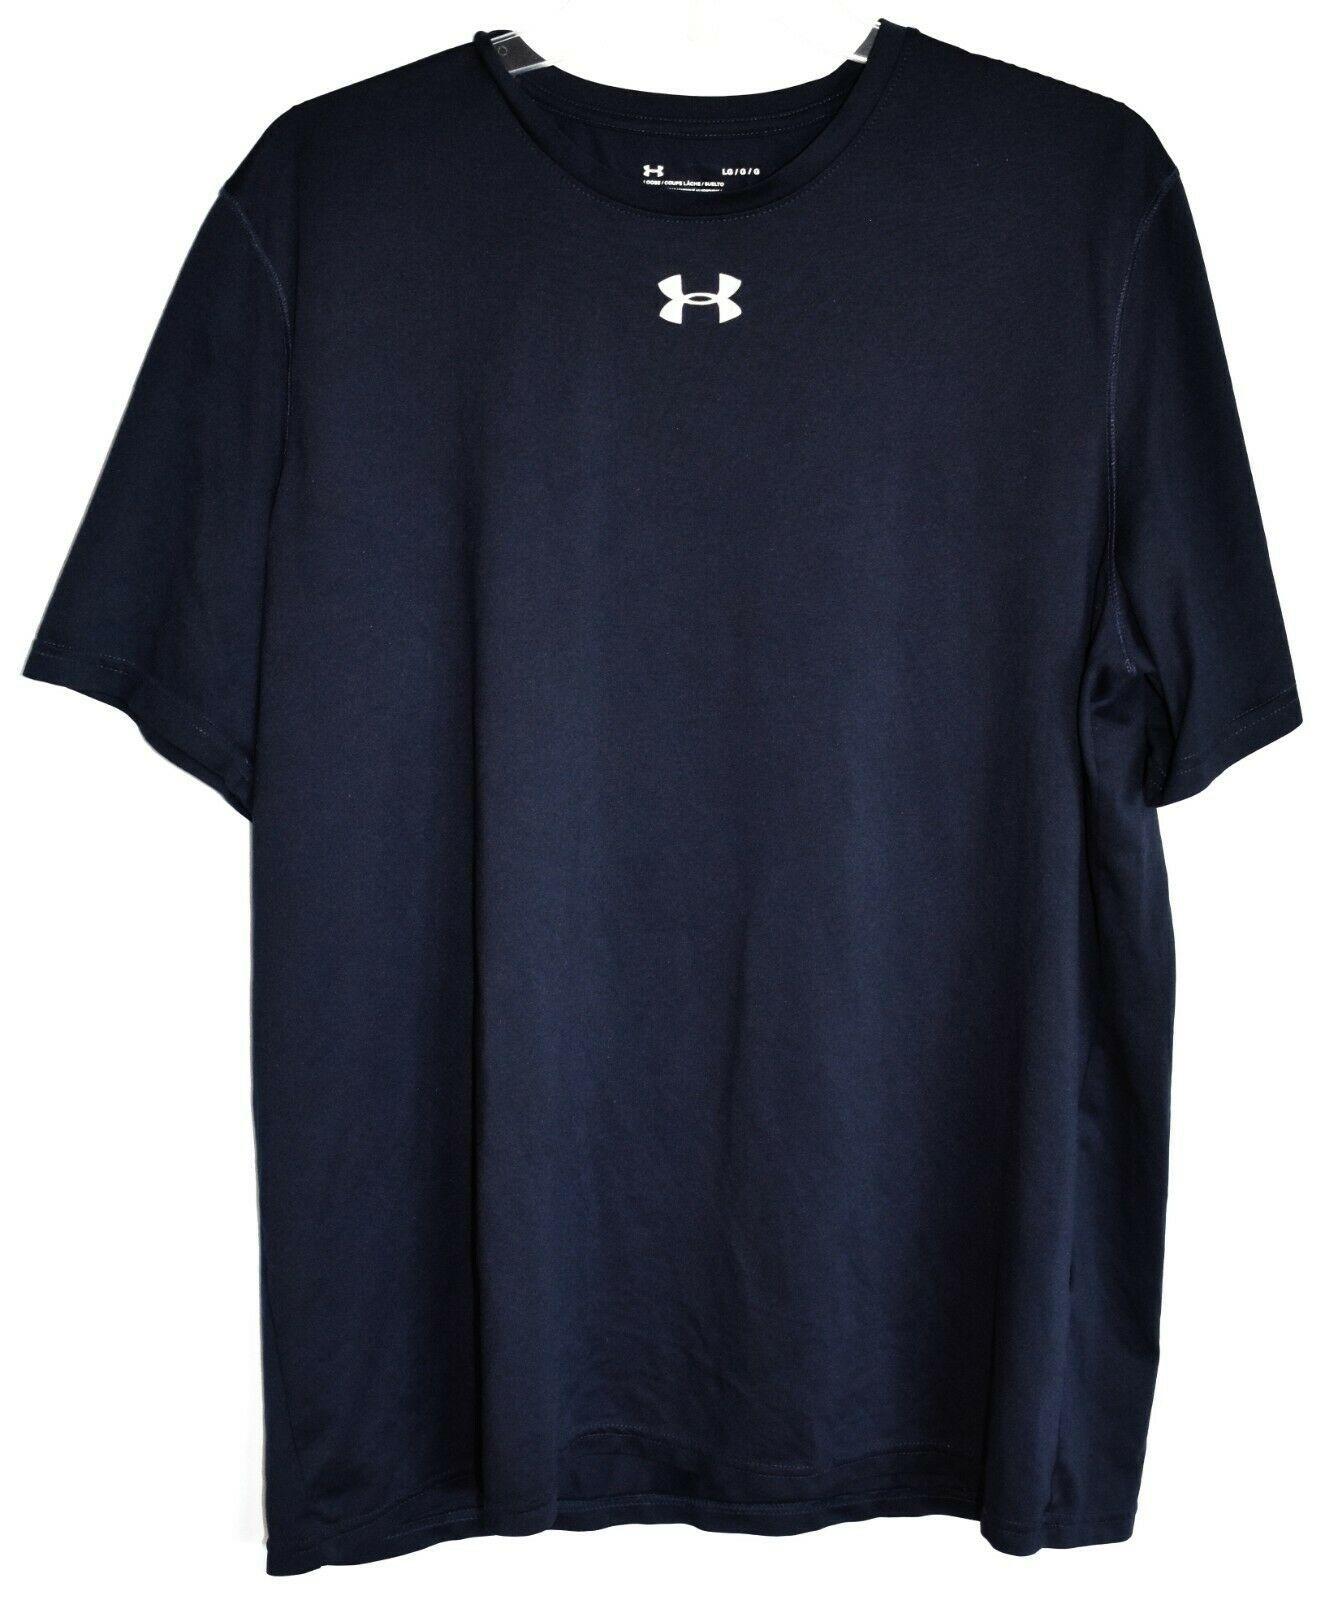 Under Armour Men's Loose HeatGear Navy Blue Short Sleeve T-Shirt Size L